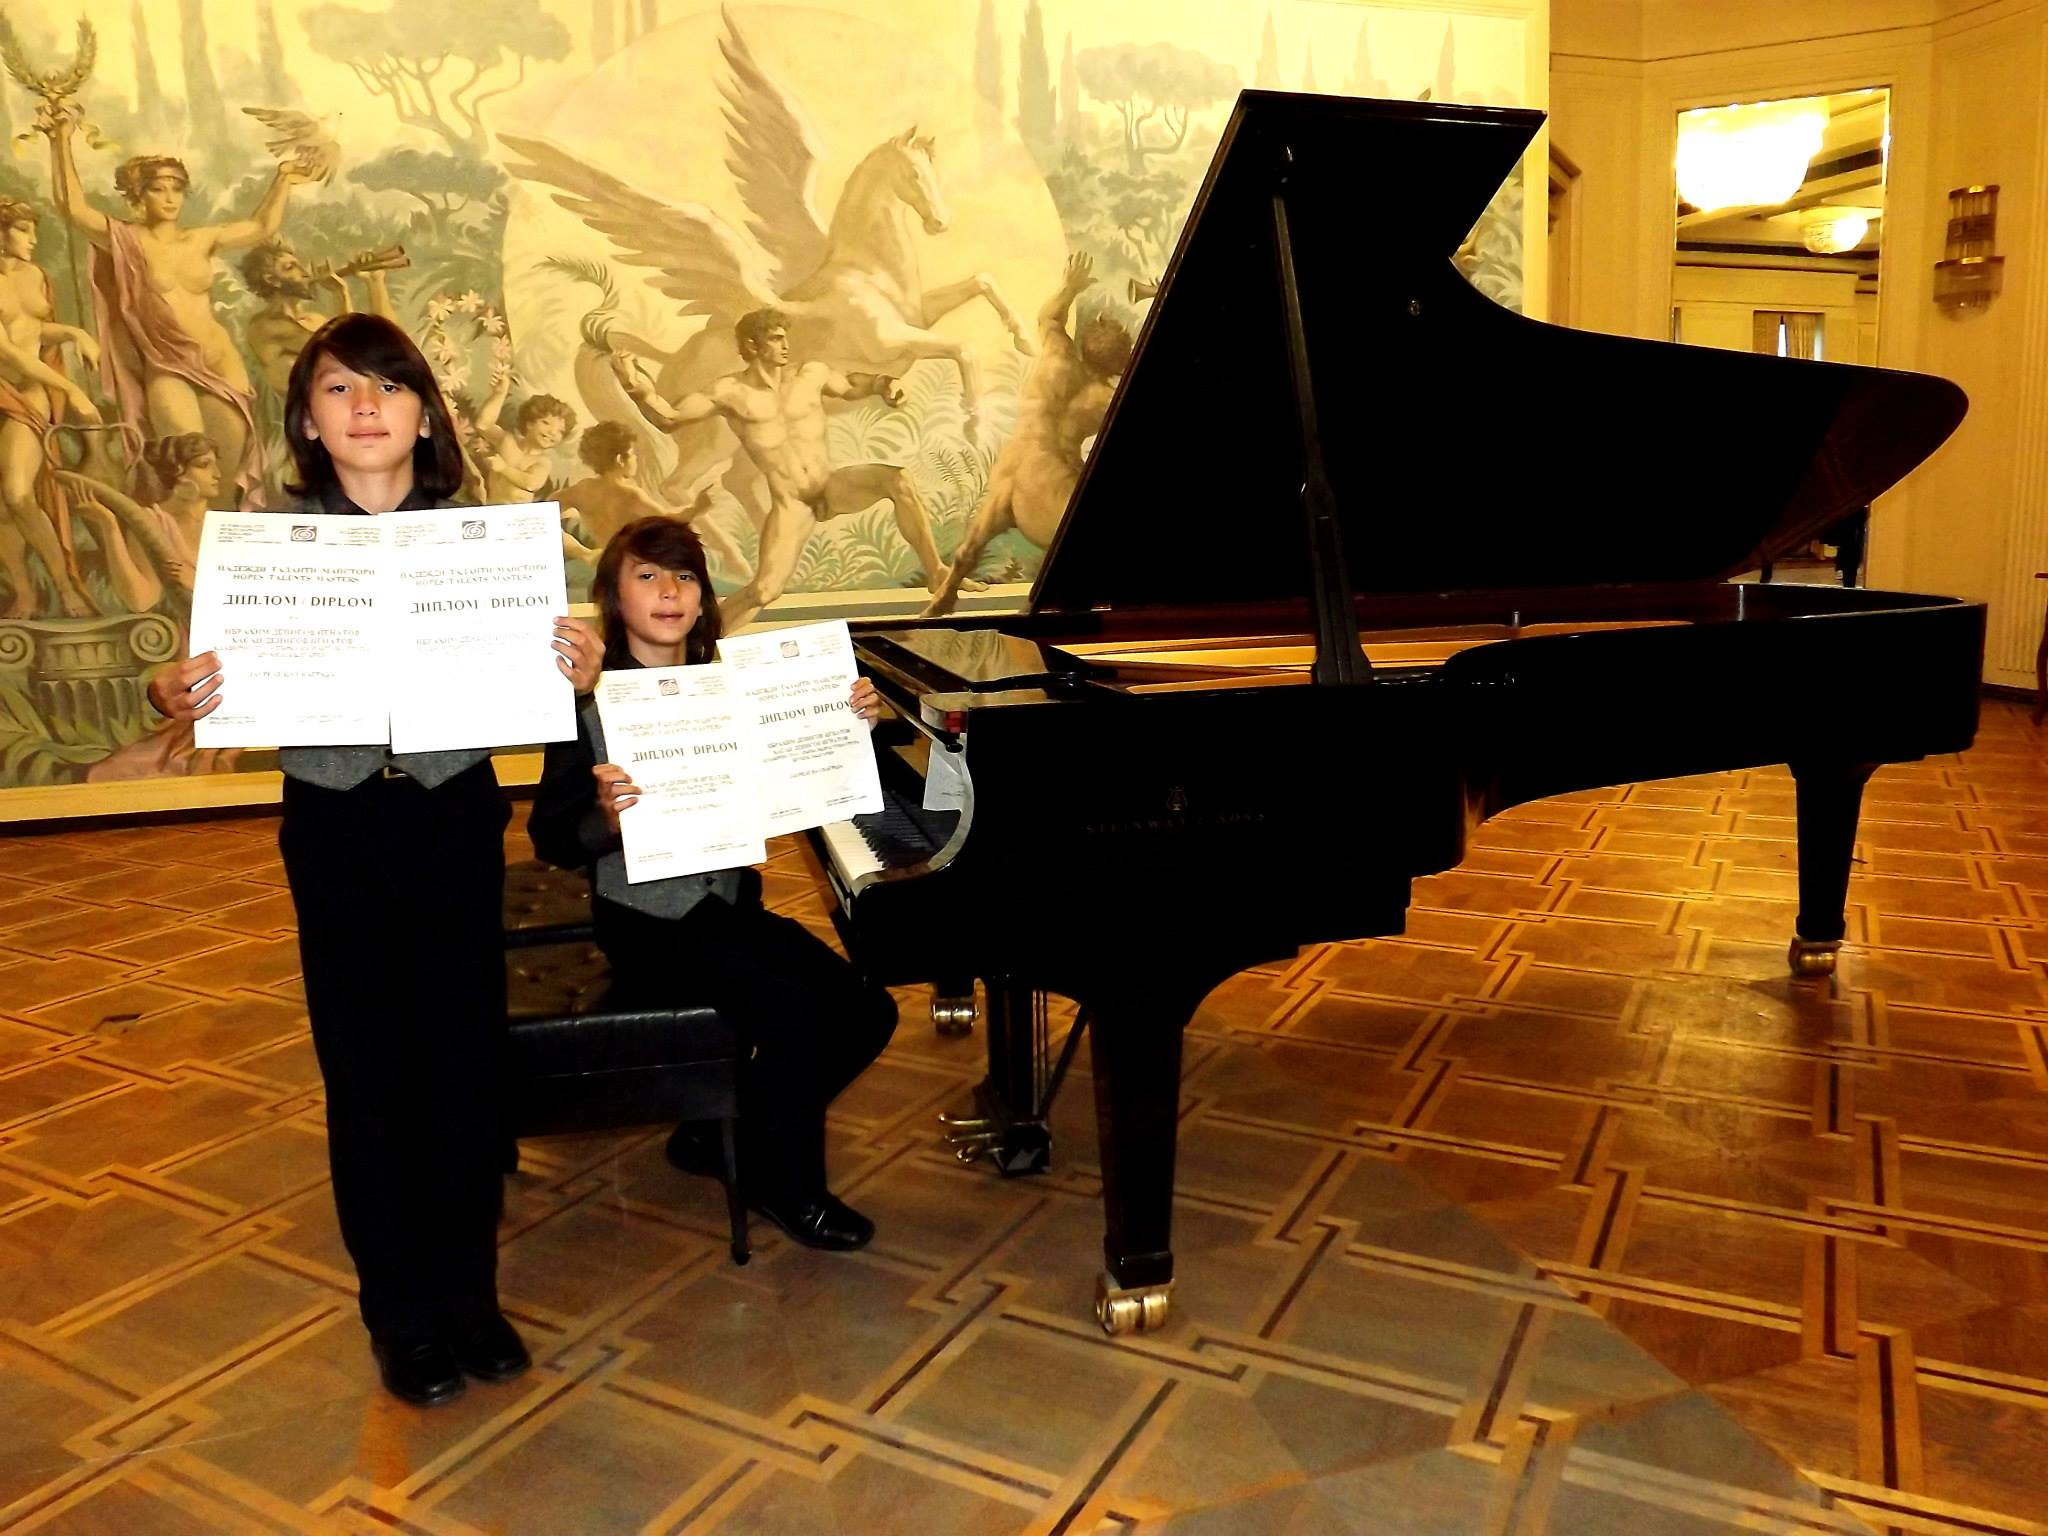 Julia Nachalova told the truth 10.10.2011 43